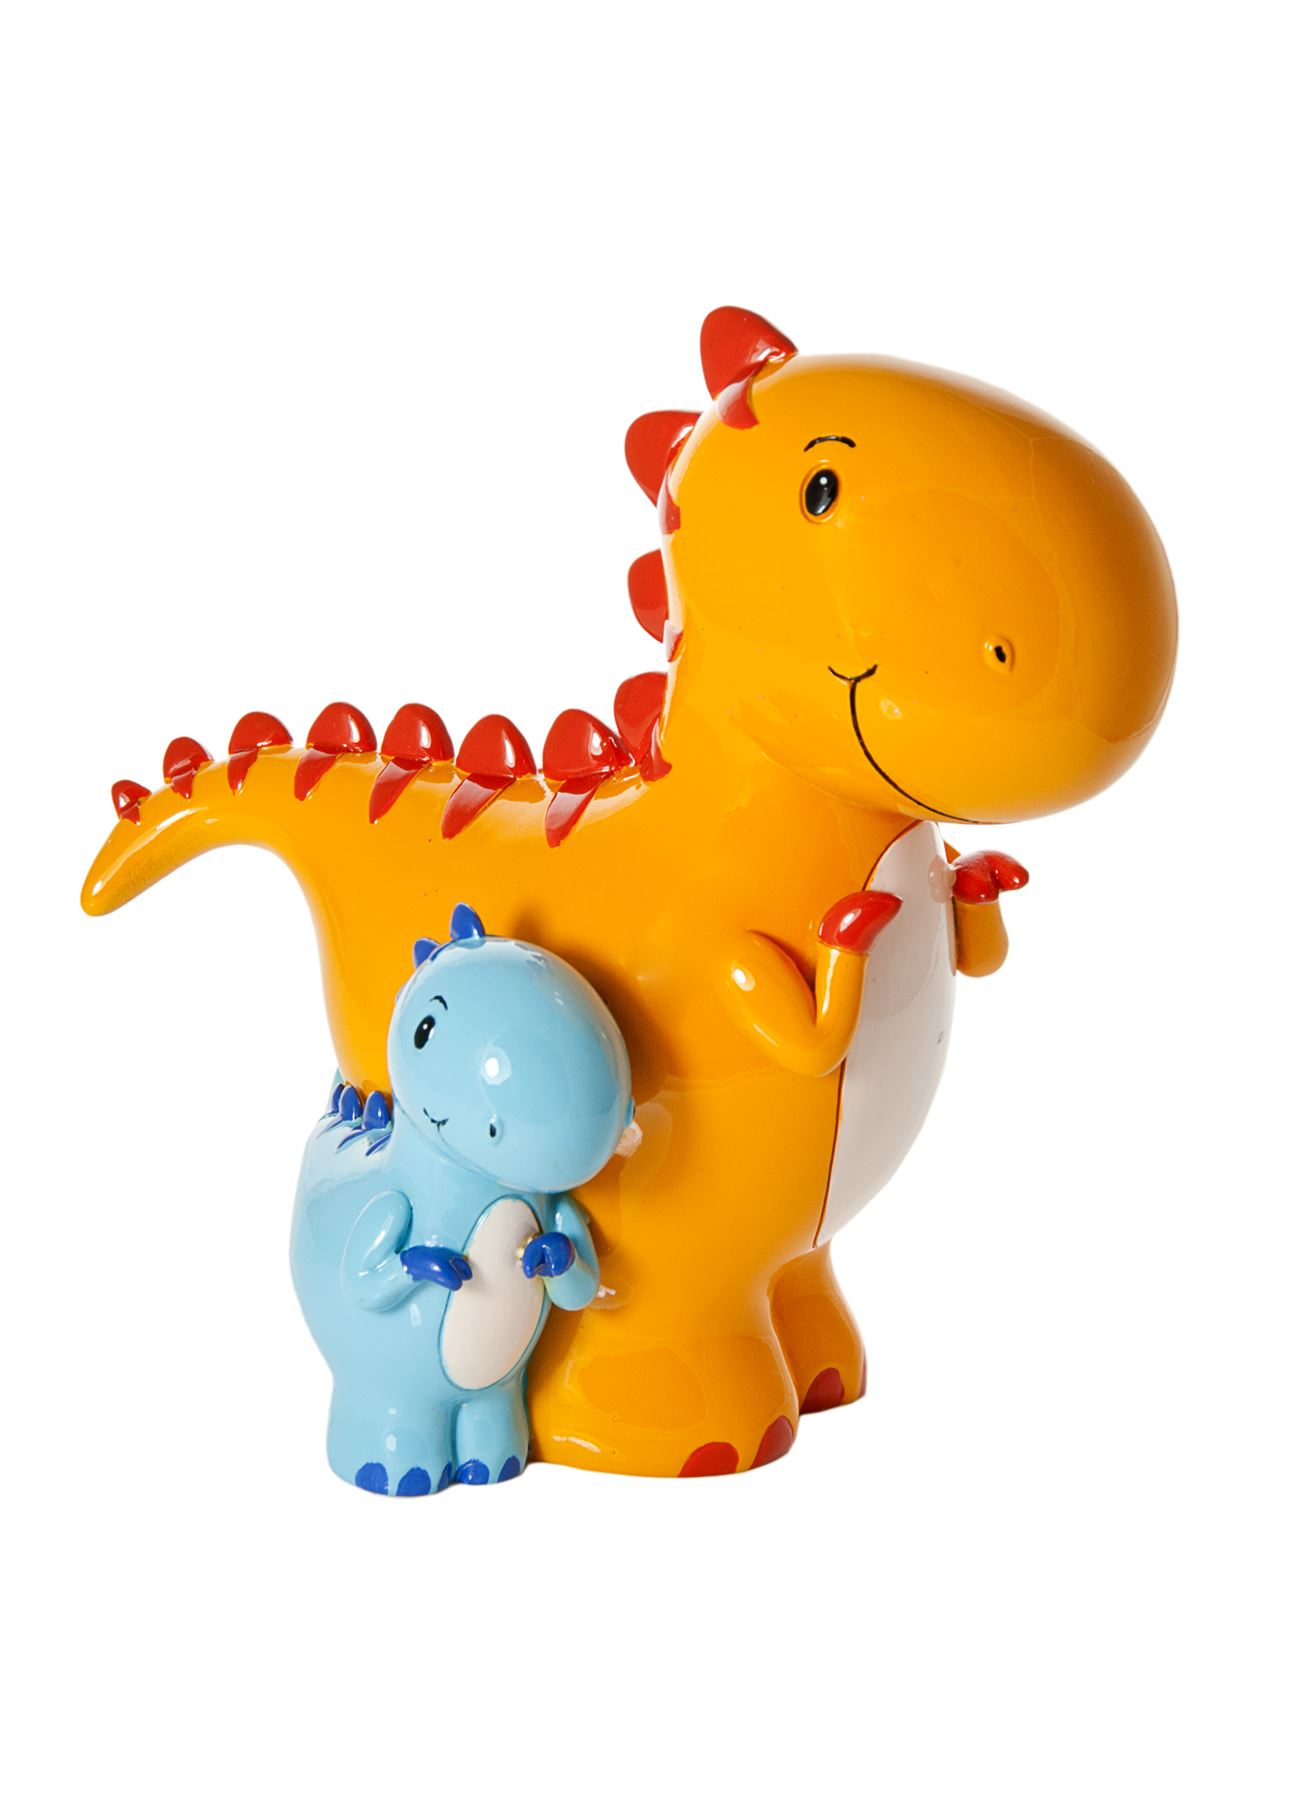 Mummy Baby Dinosaur Money Box Piggy Bank Coin Savings Kids Baby Toddler Boy Girl